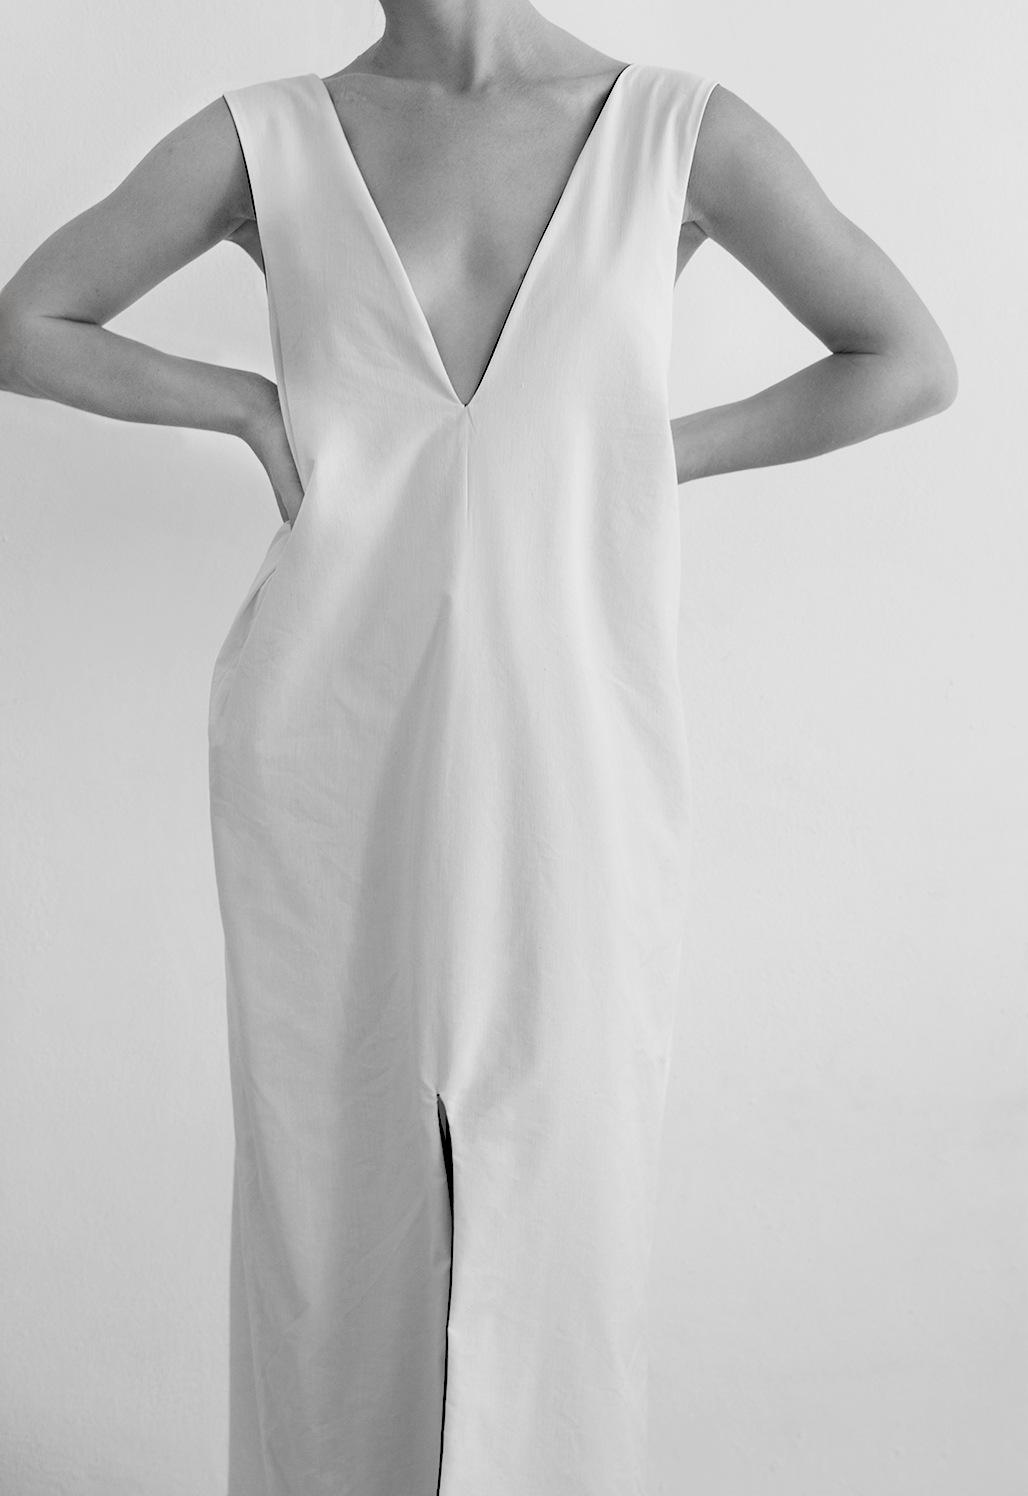 Dress by Vlad Epshtein